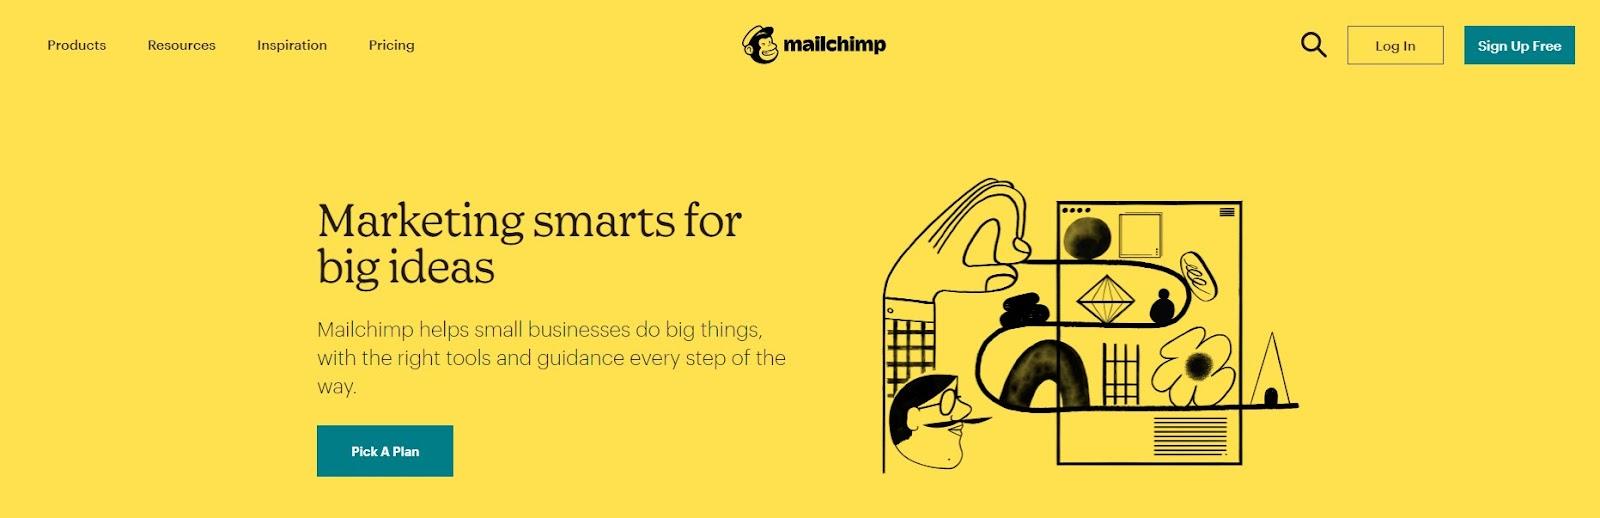 Screenshot of Mailchimp's website.